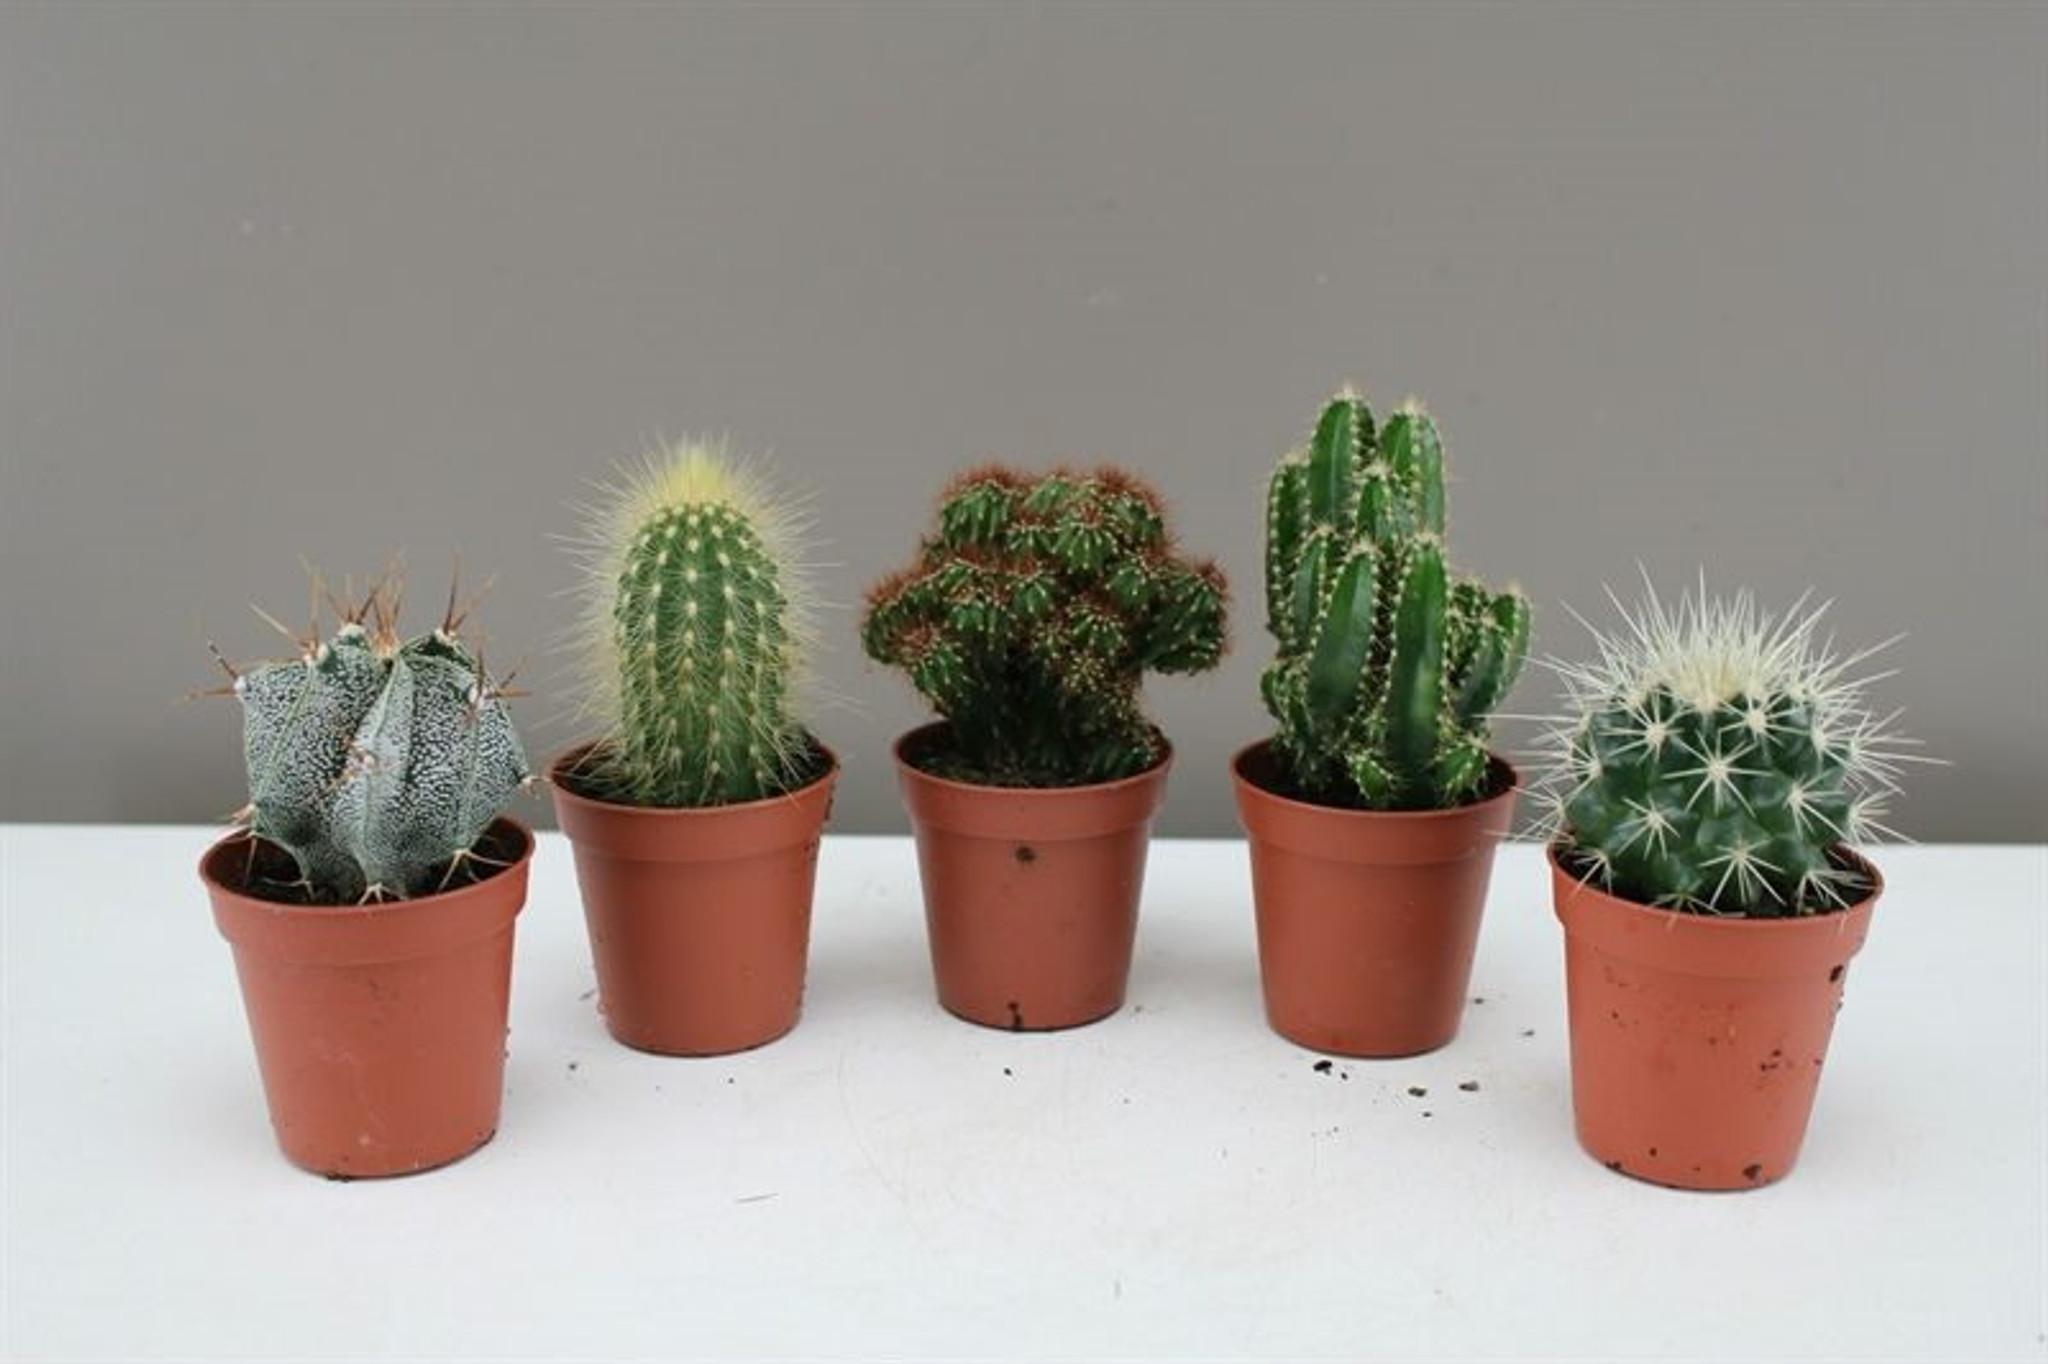 Small Cactus Gift Set